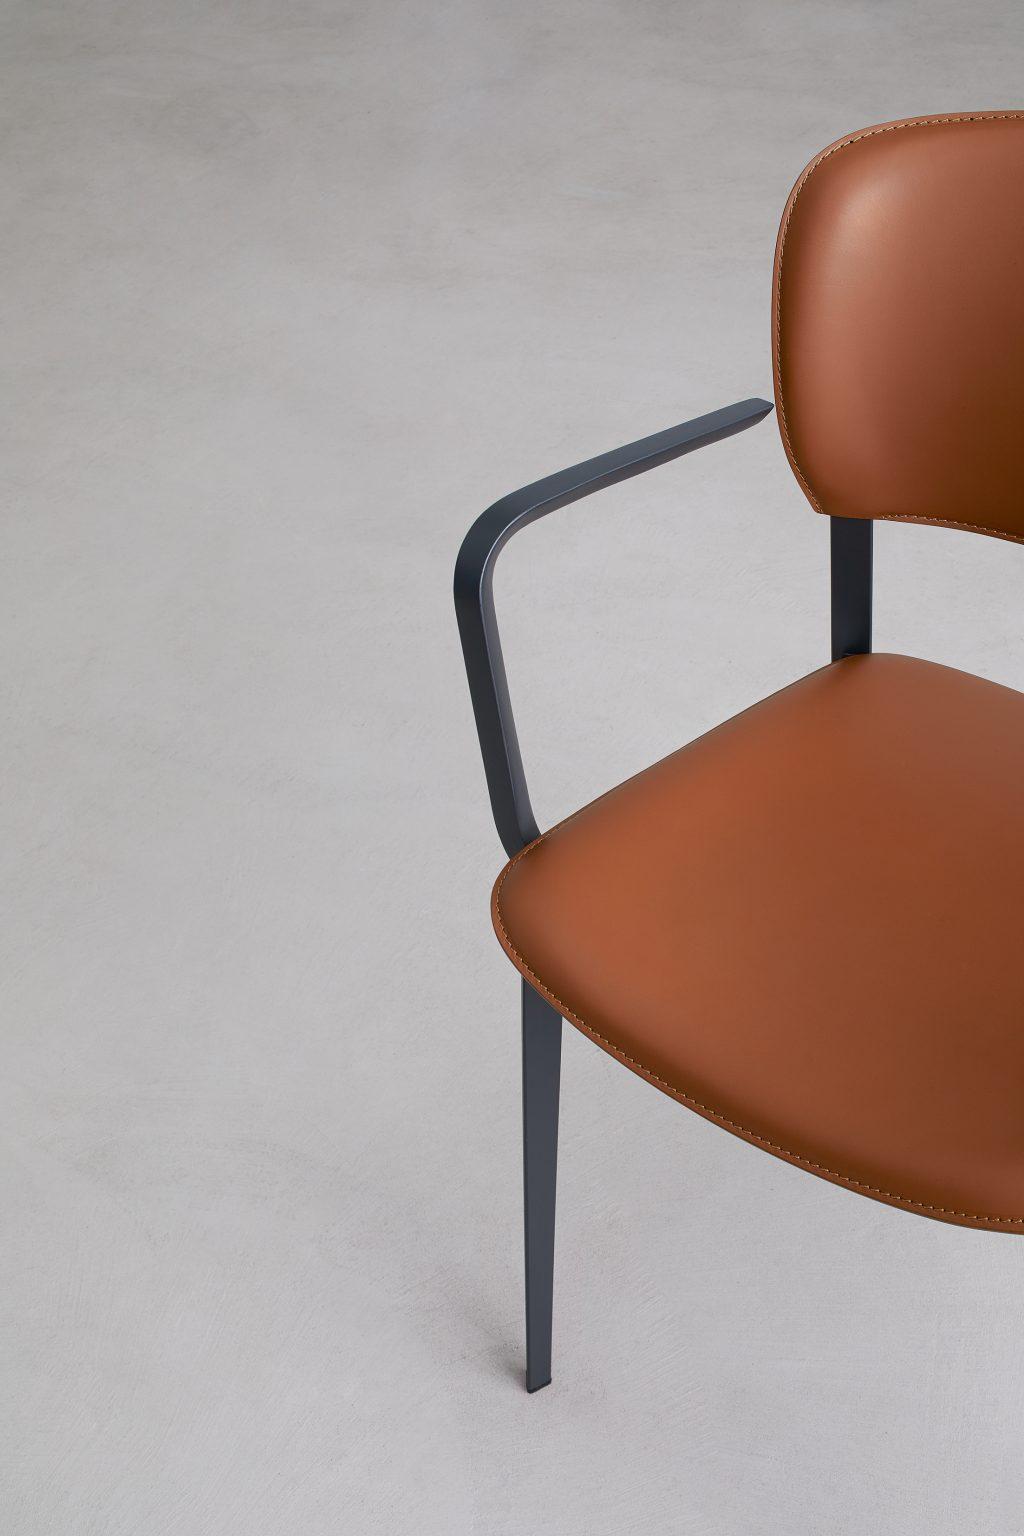 Biennale Interieur - Belgium's leading design and interior event - Ply-3-1.jpg